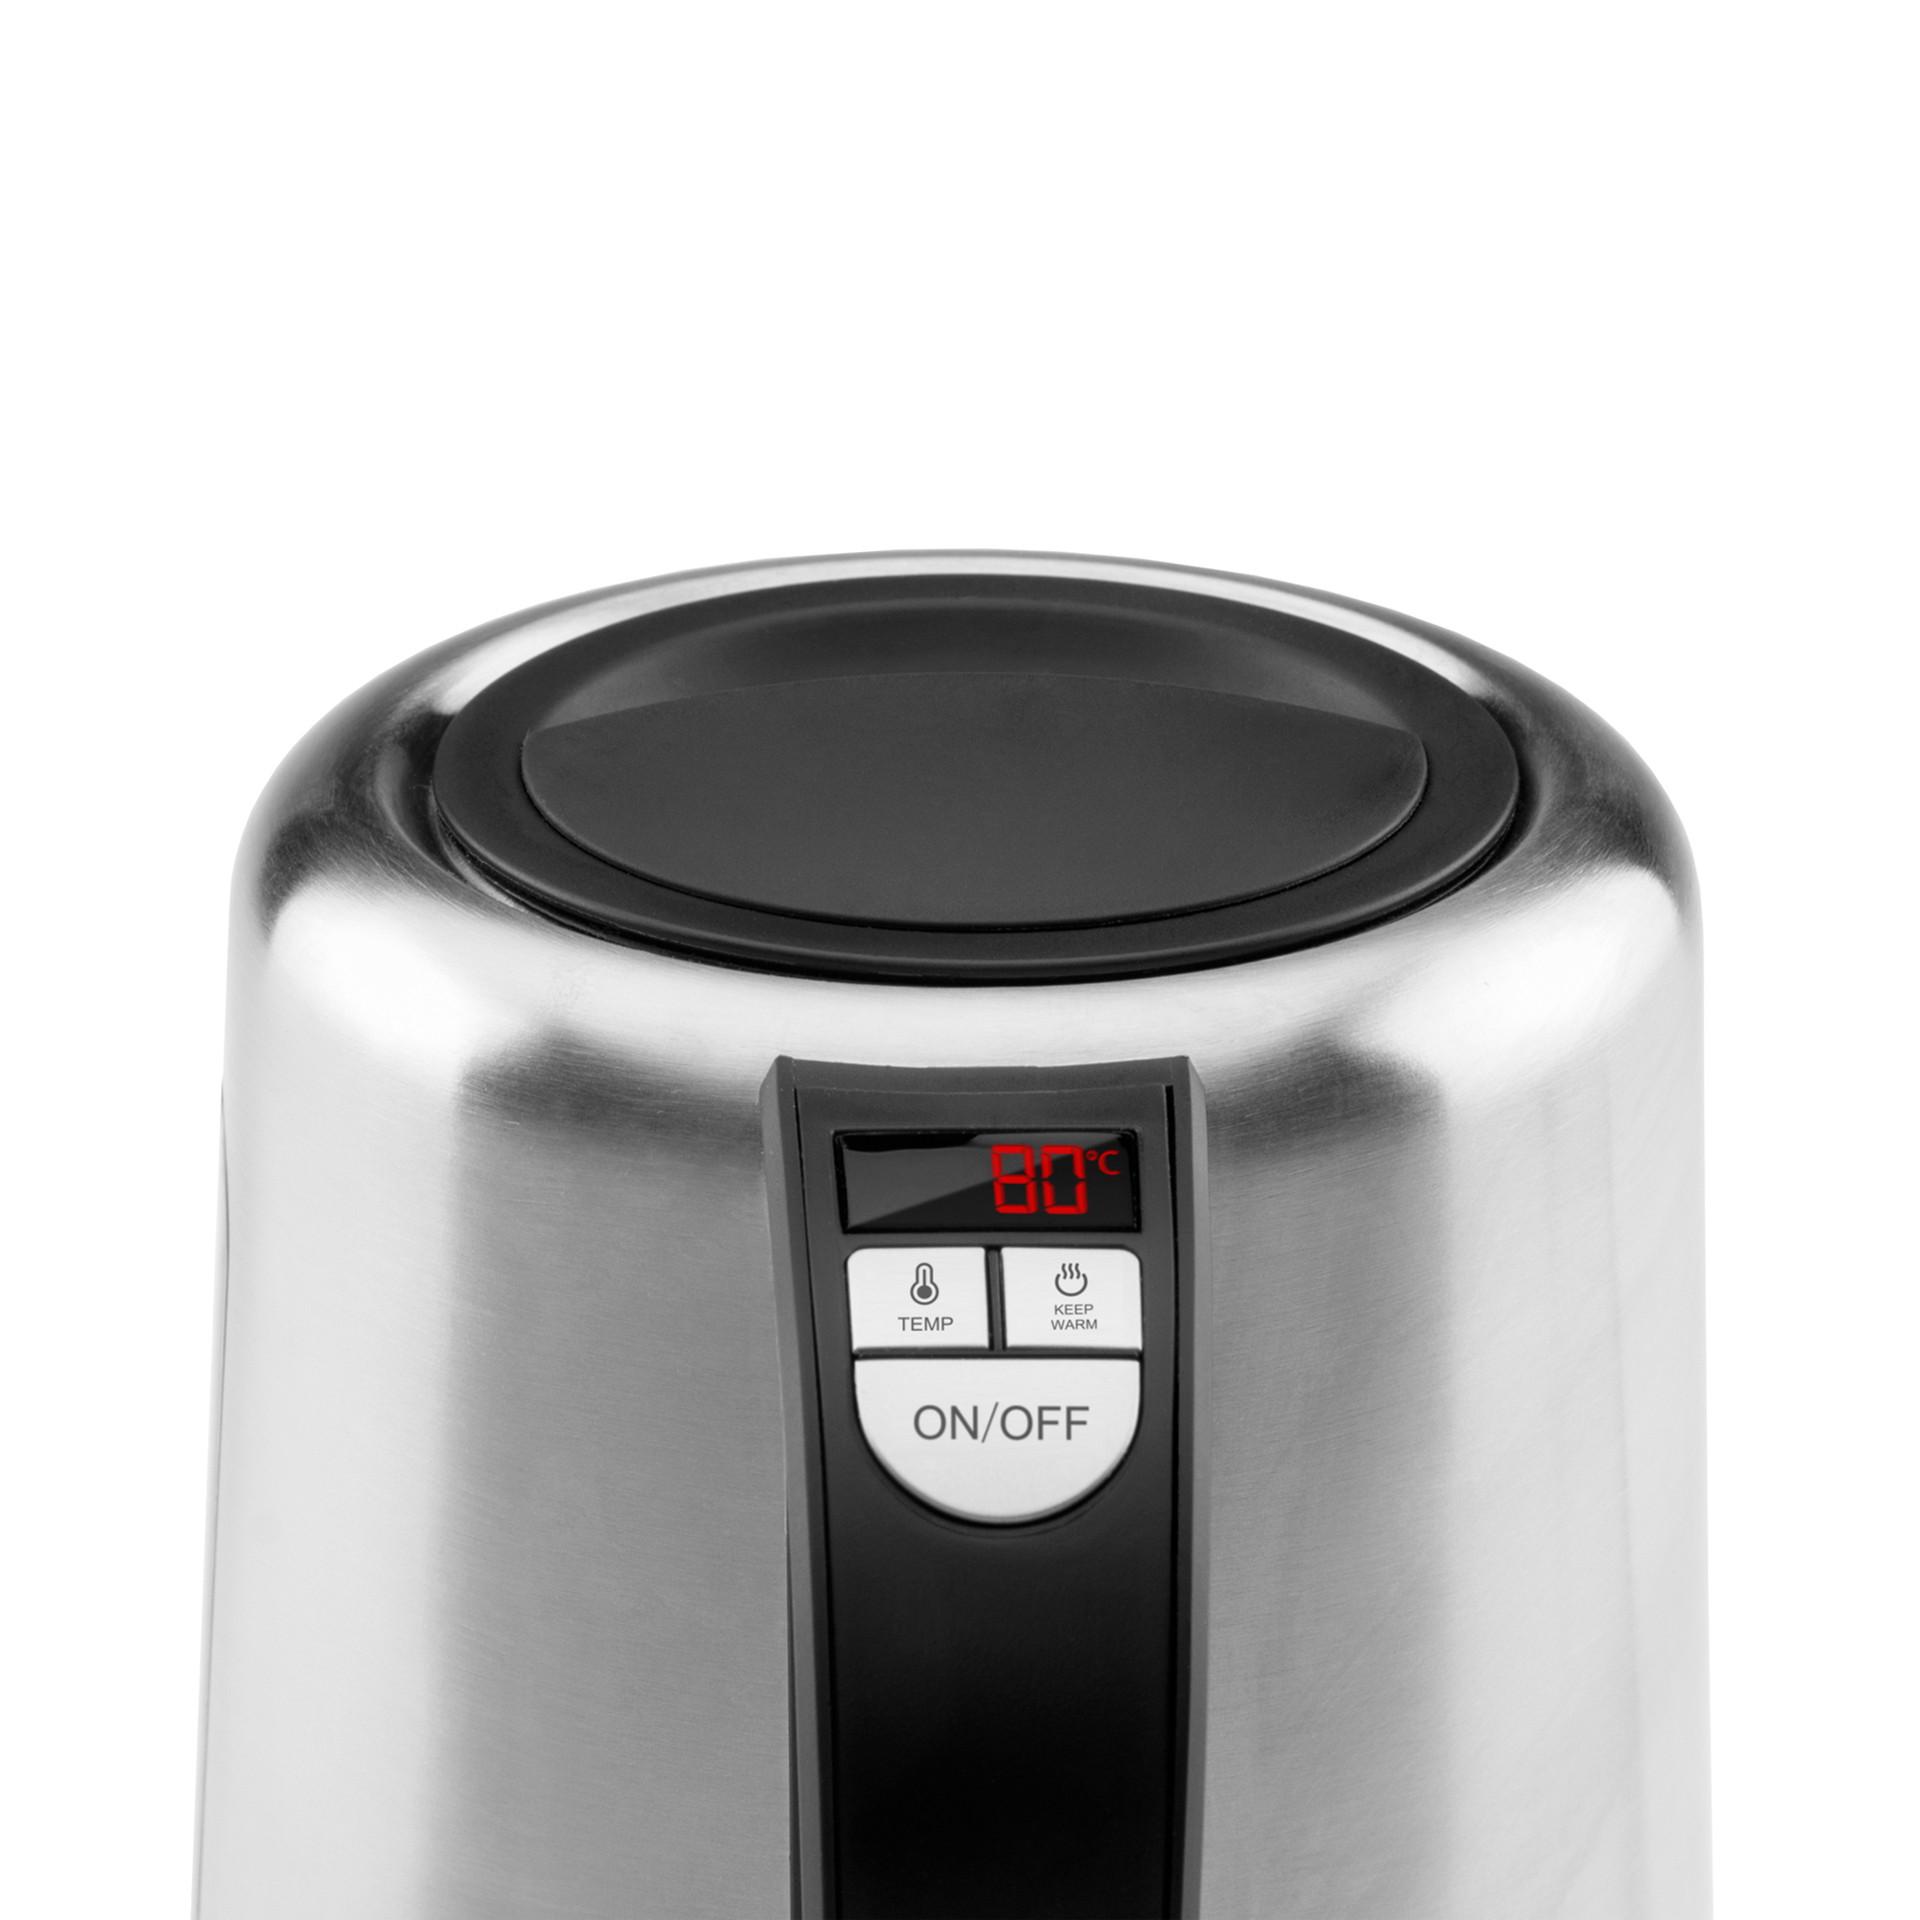 Rychlovarná konvice s obsahem 1 litr Gastroback 42435